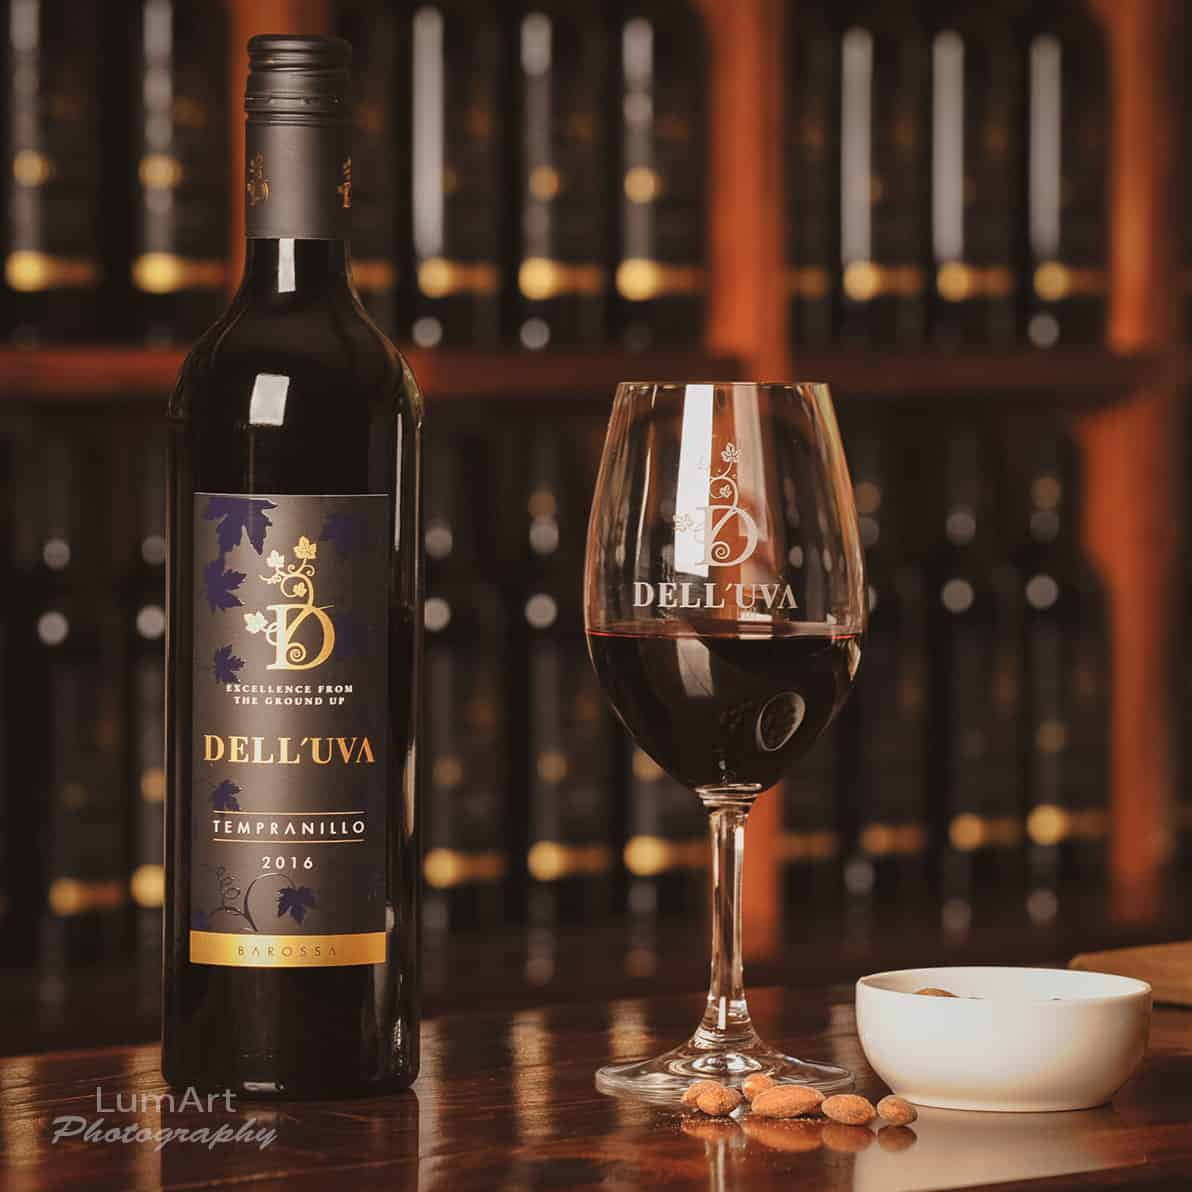 LumArt_Food and Wine_18_Delluva_Tempranillo_Lifestyle